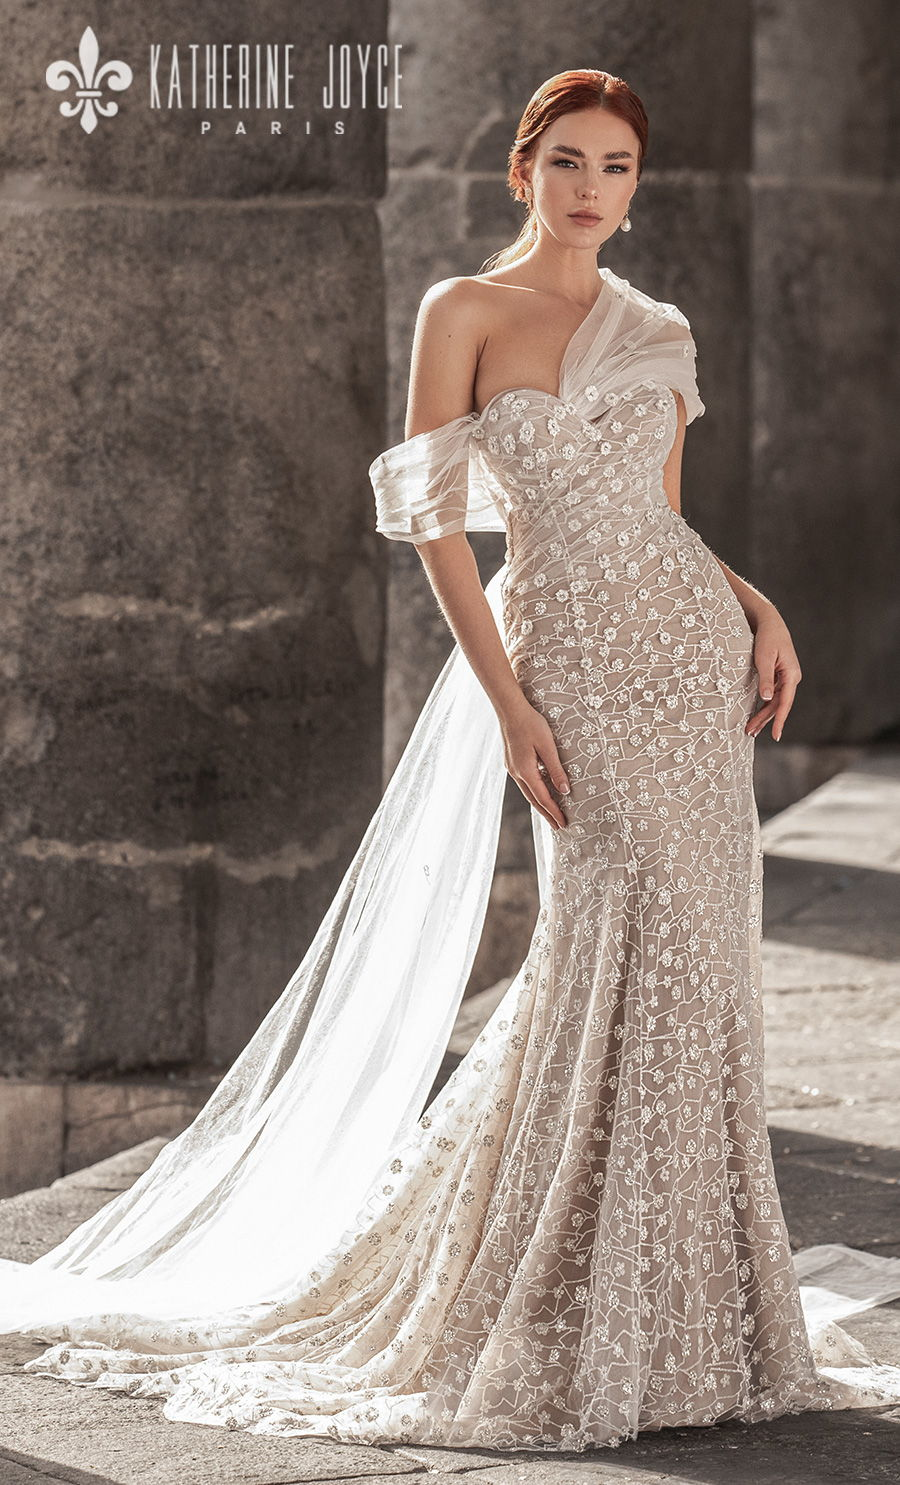 katherine joyce 2021 naples bridal one shoulder sweetheart neckline full embellishment romantic fit and flare ivory wedding dress mid back medium train (zarina) mv